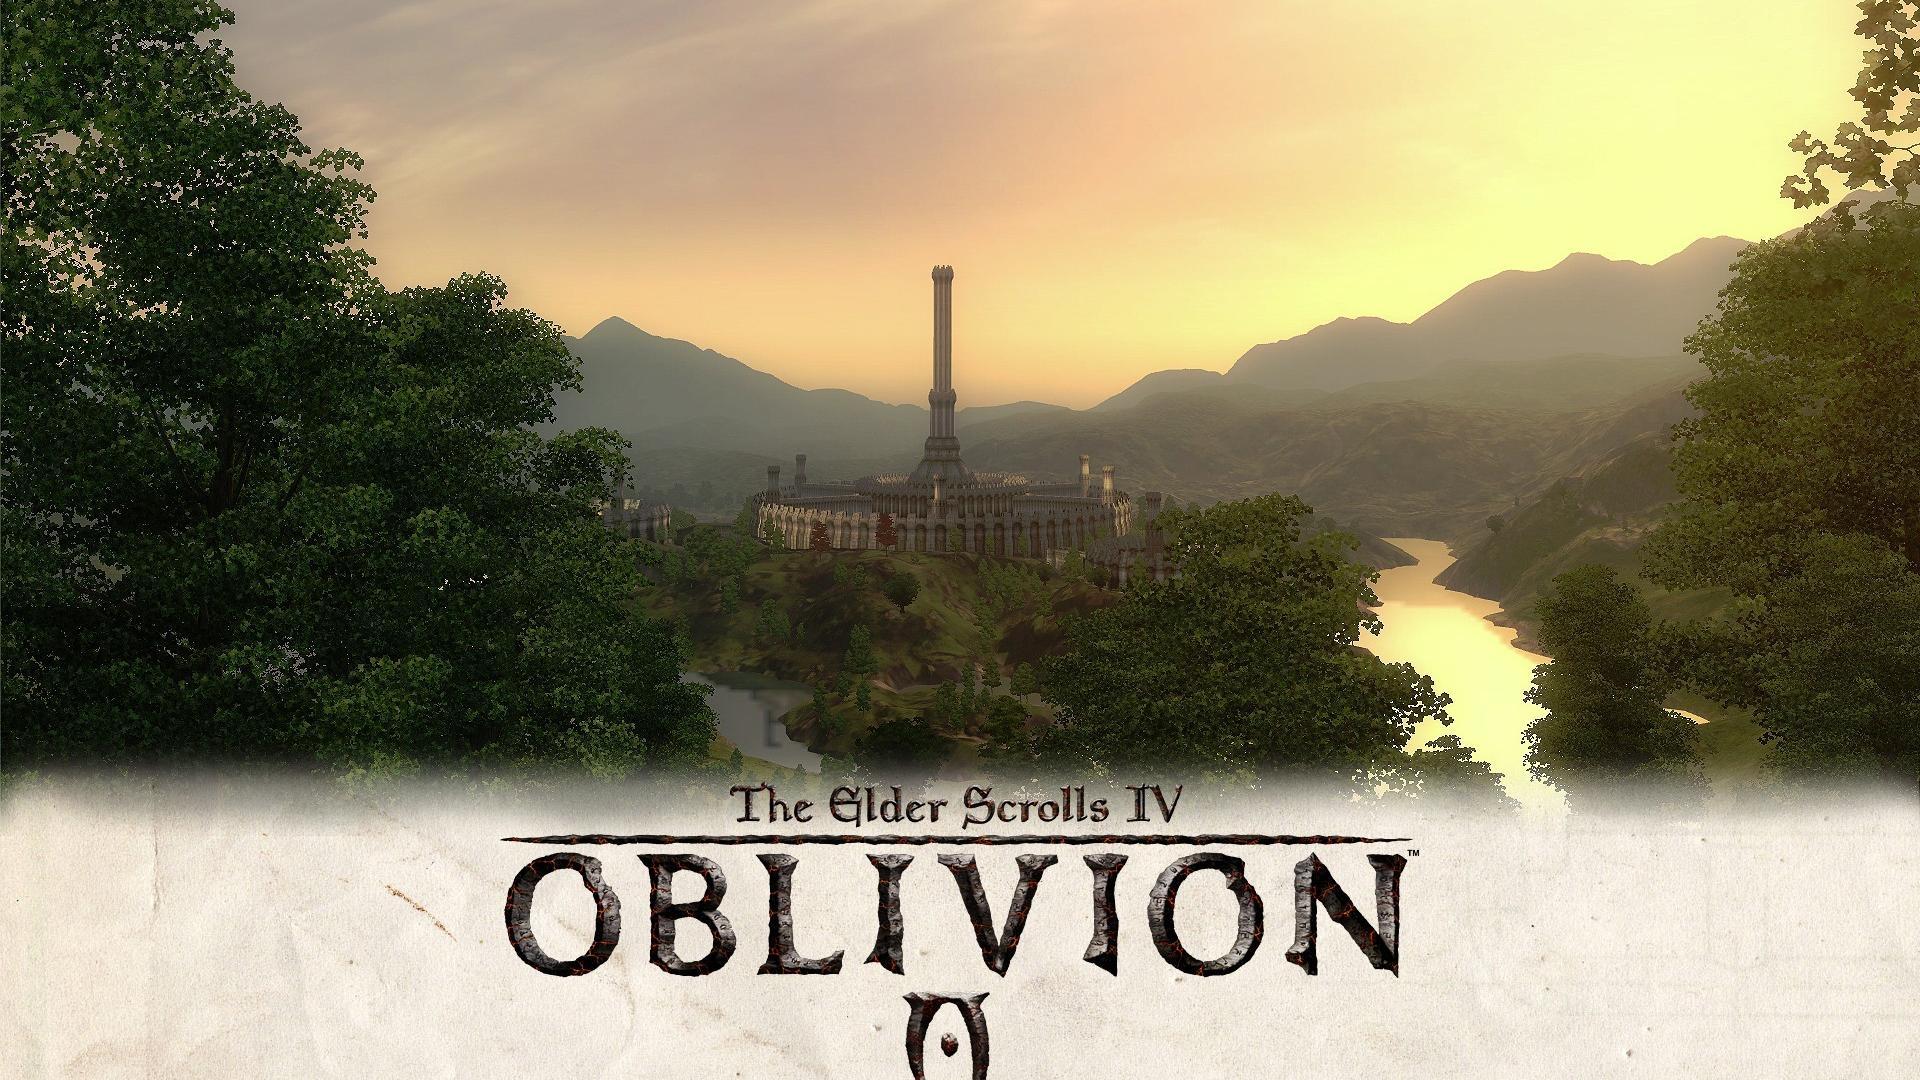 Постер The Elder Scrolls IV: Oblivion